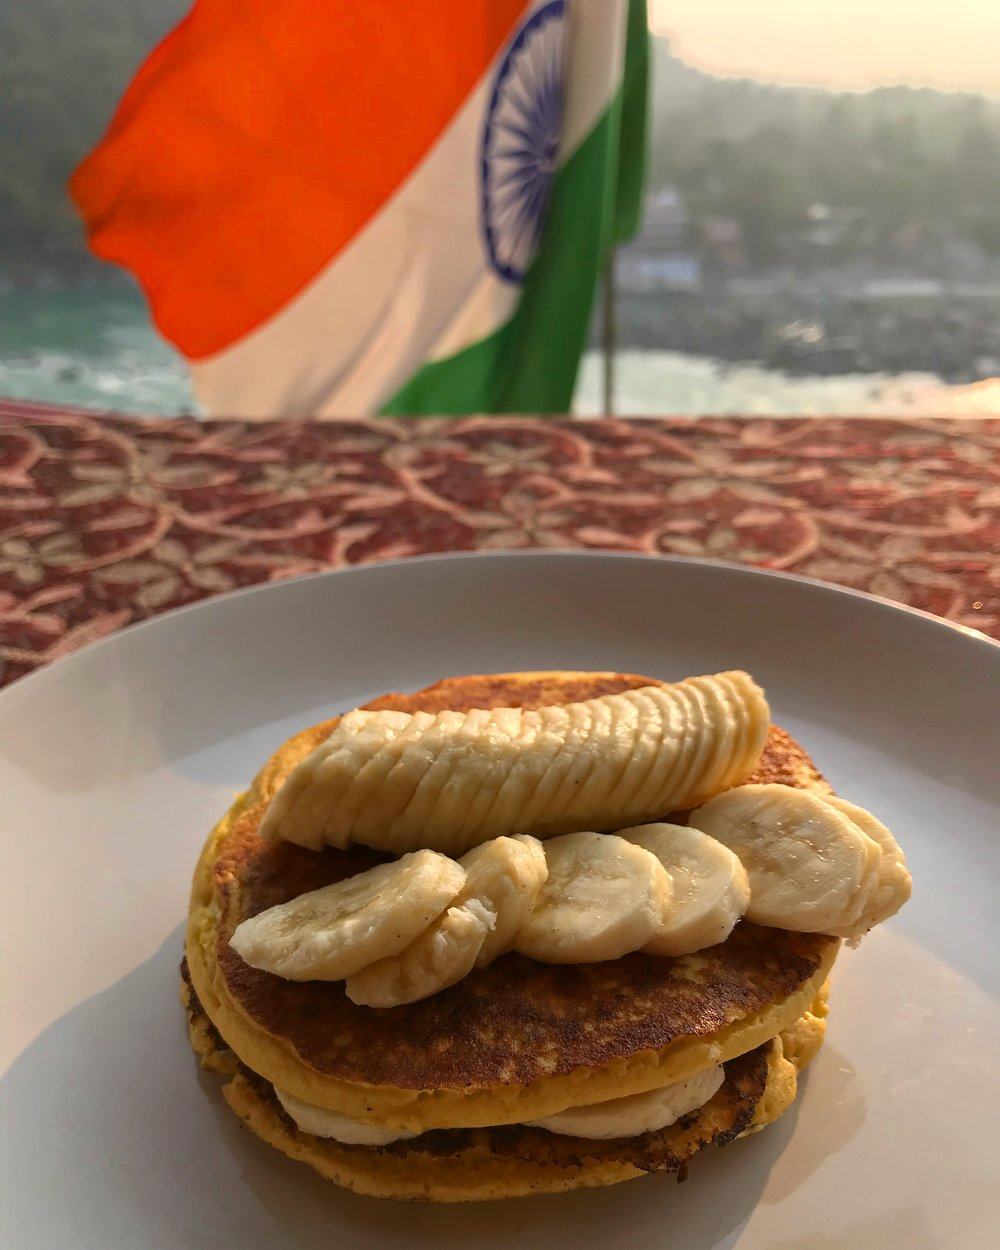 Gluten free vegan pancakes in Rishikesh, India where the whole city is vegetarian.